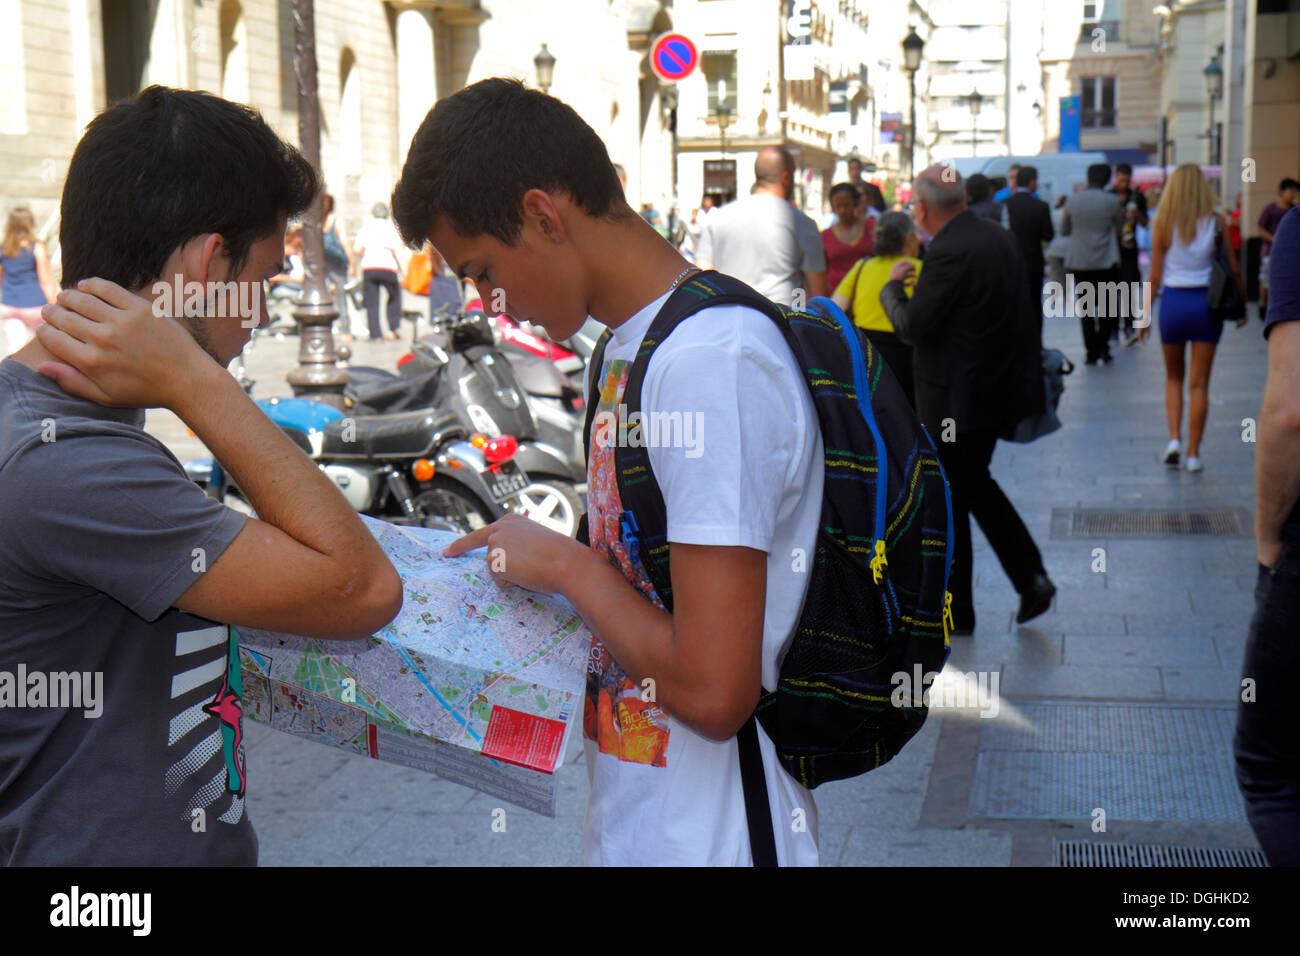 Paris France Europe French 9th arrondissement Boulevard Haussmann teen boy friends street map looking at - Stock Image